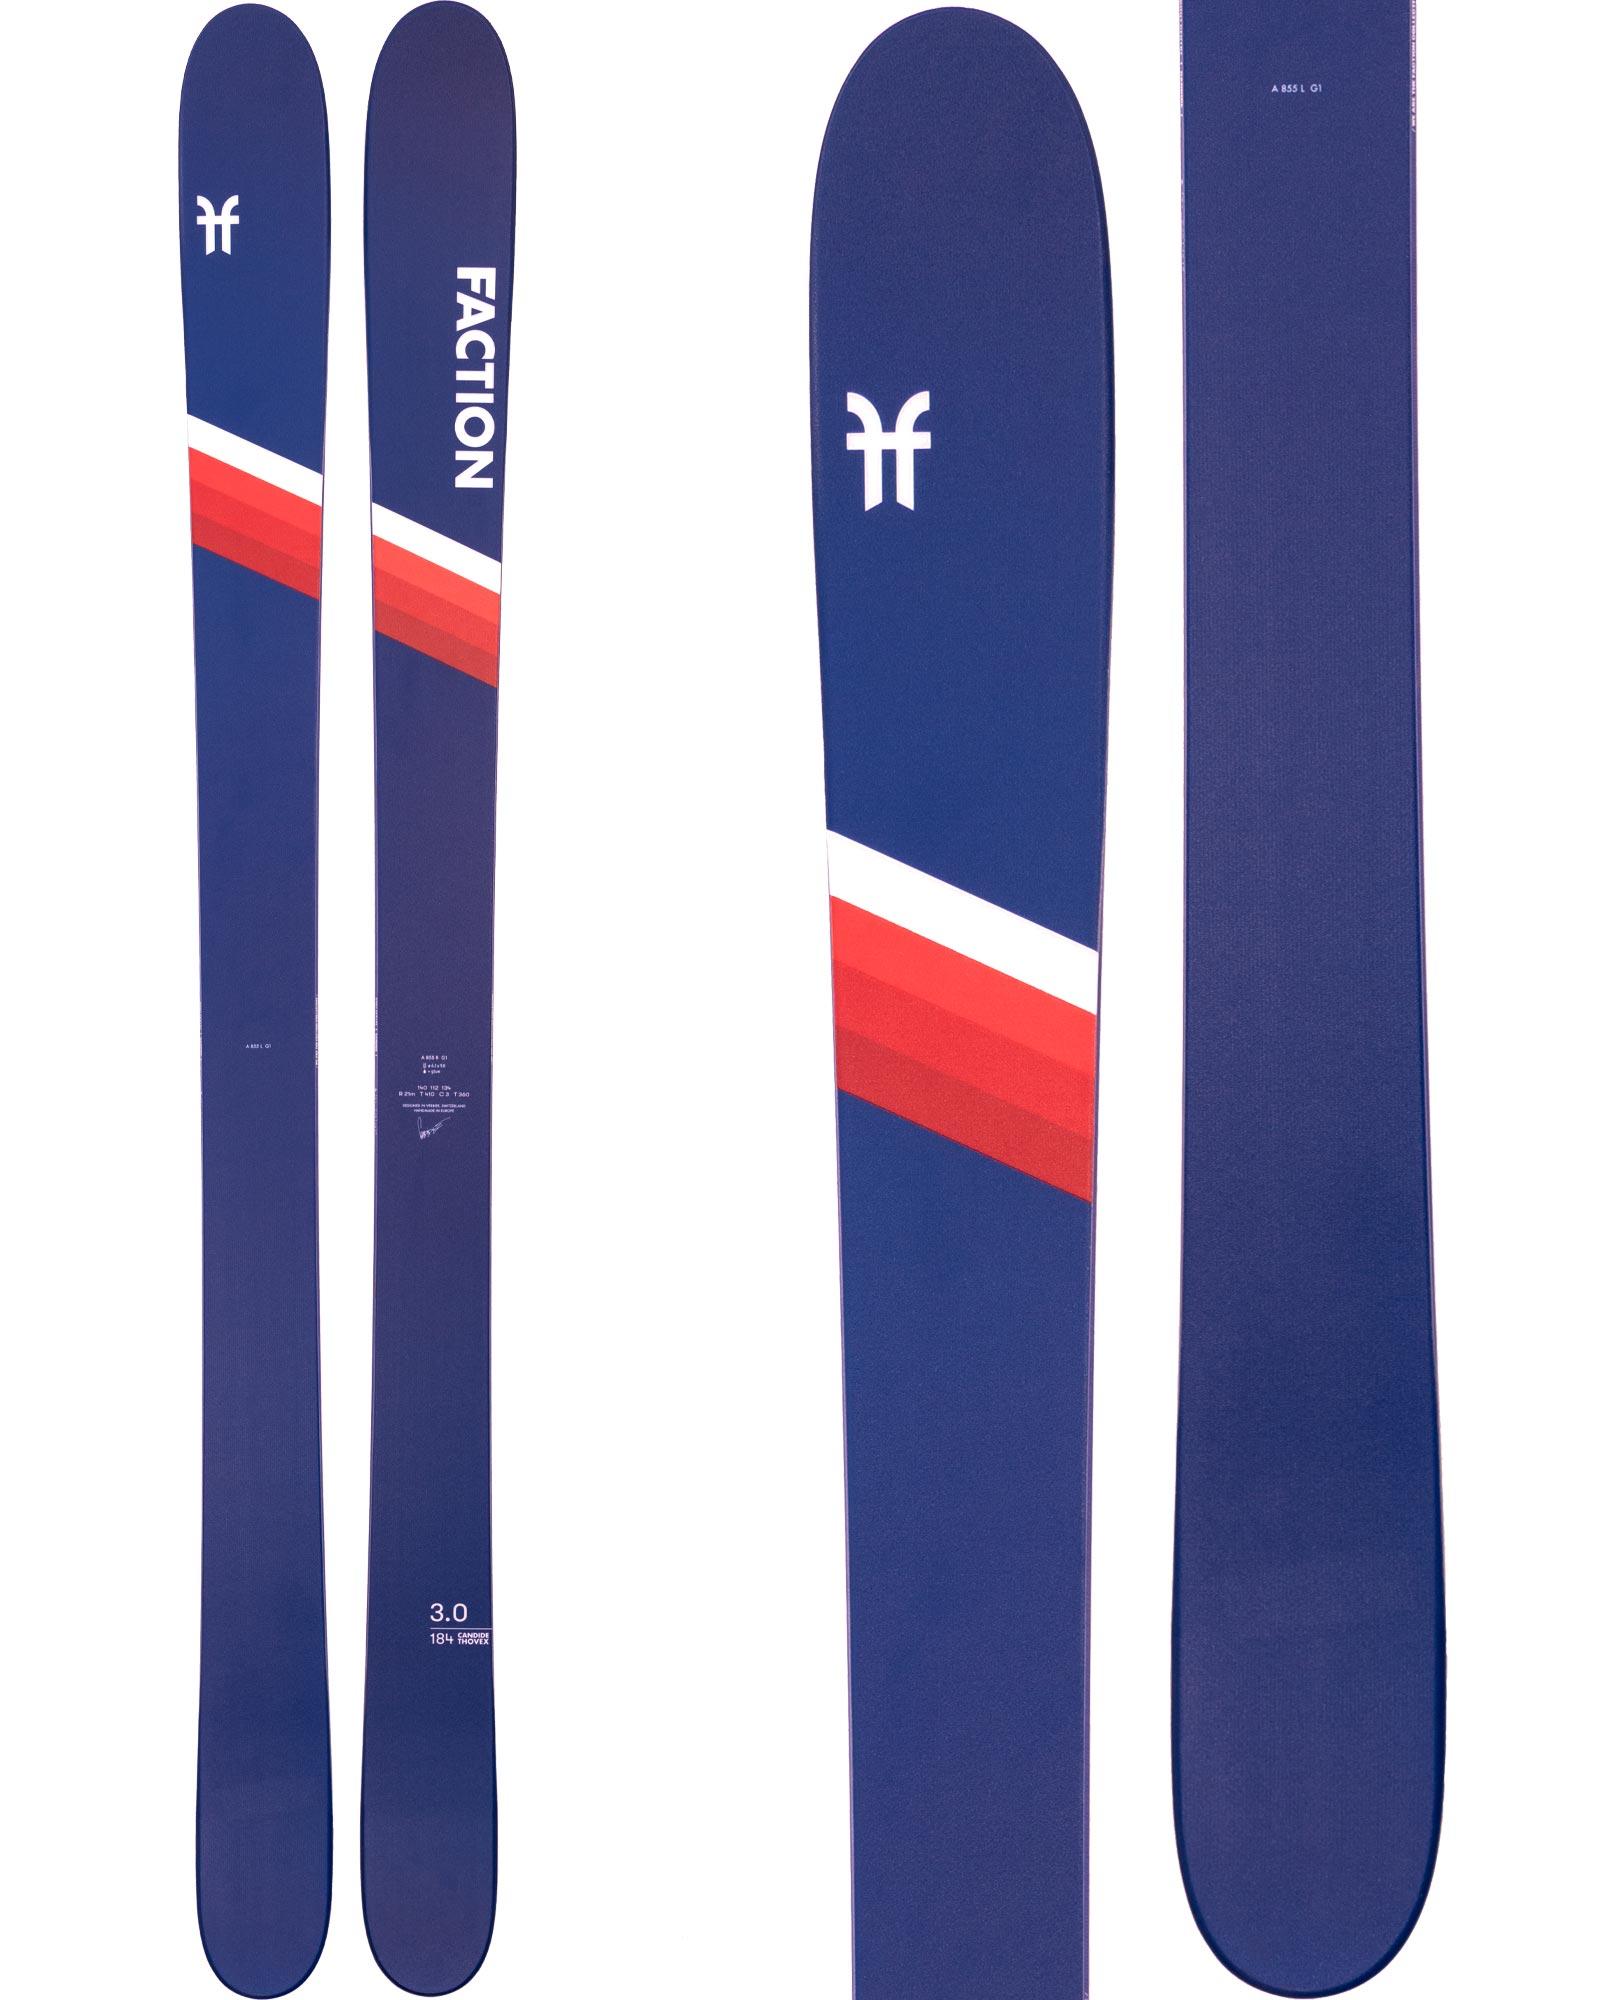 Faction Men's CT 3.0 Freestyle Skis 2020 / 2021 0